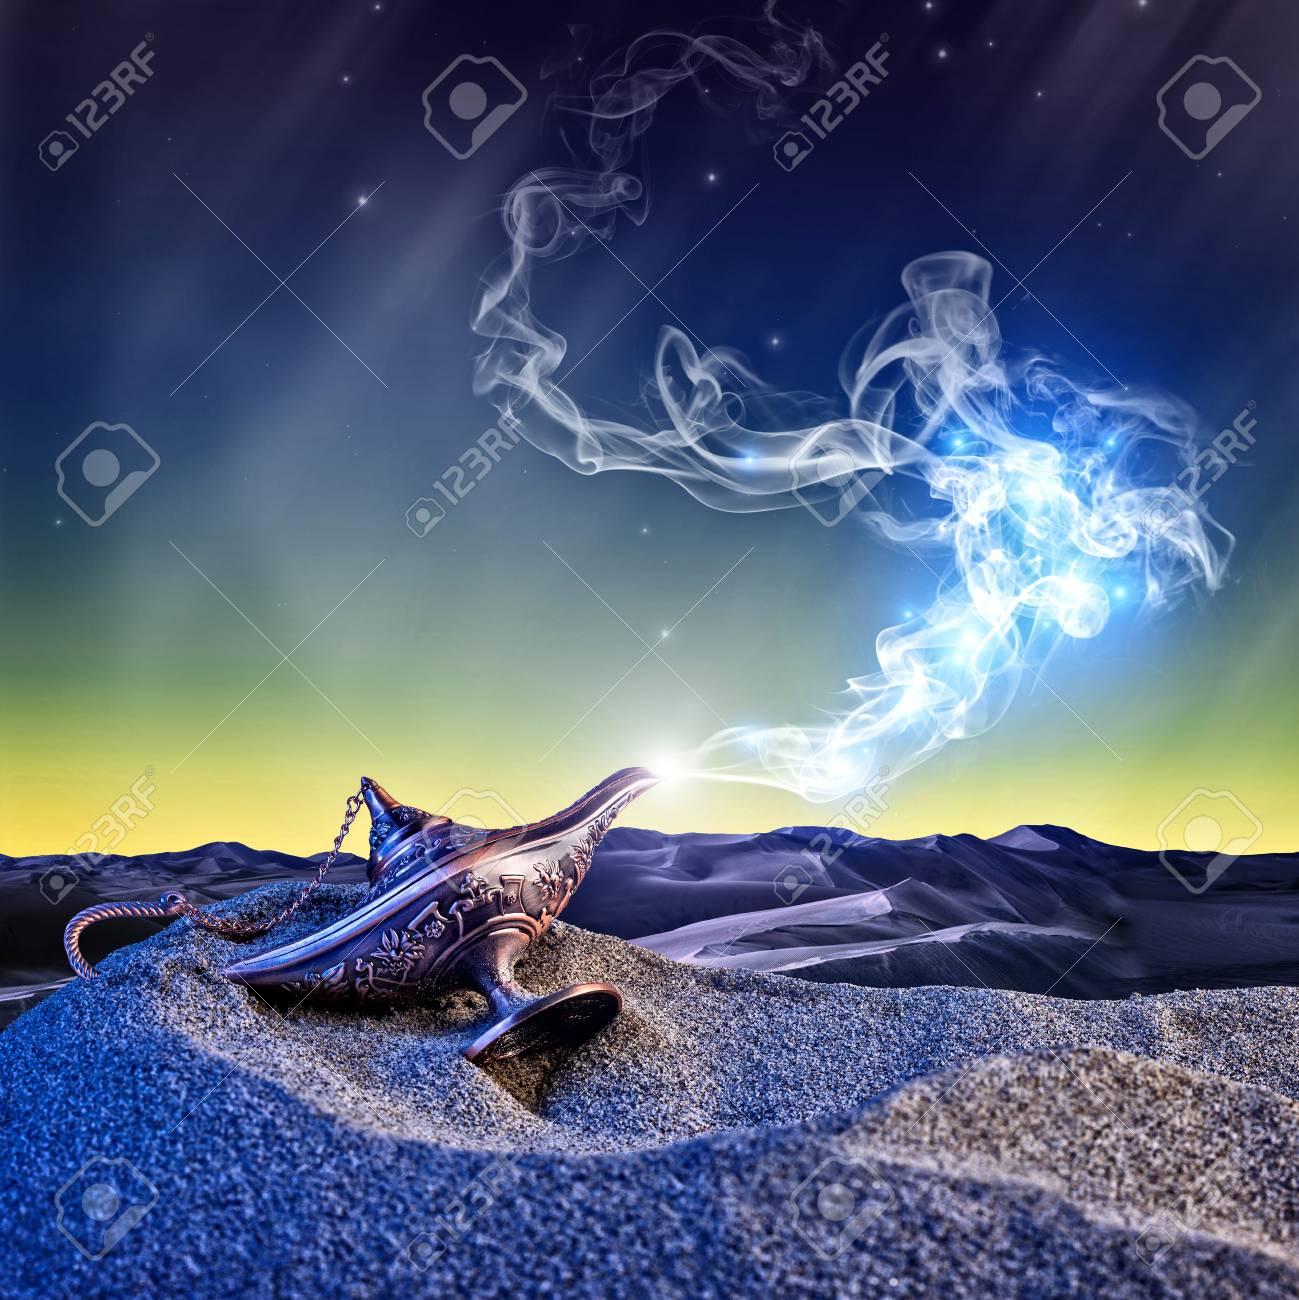 classic aladdin magic lamp in the desert night scene - 80353835